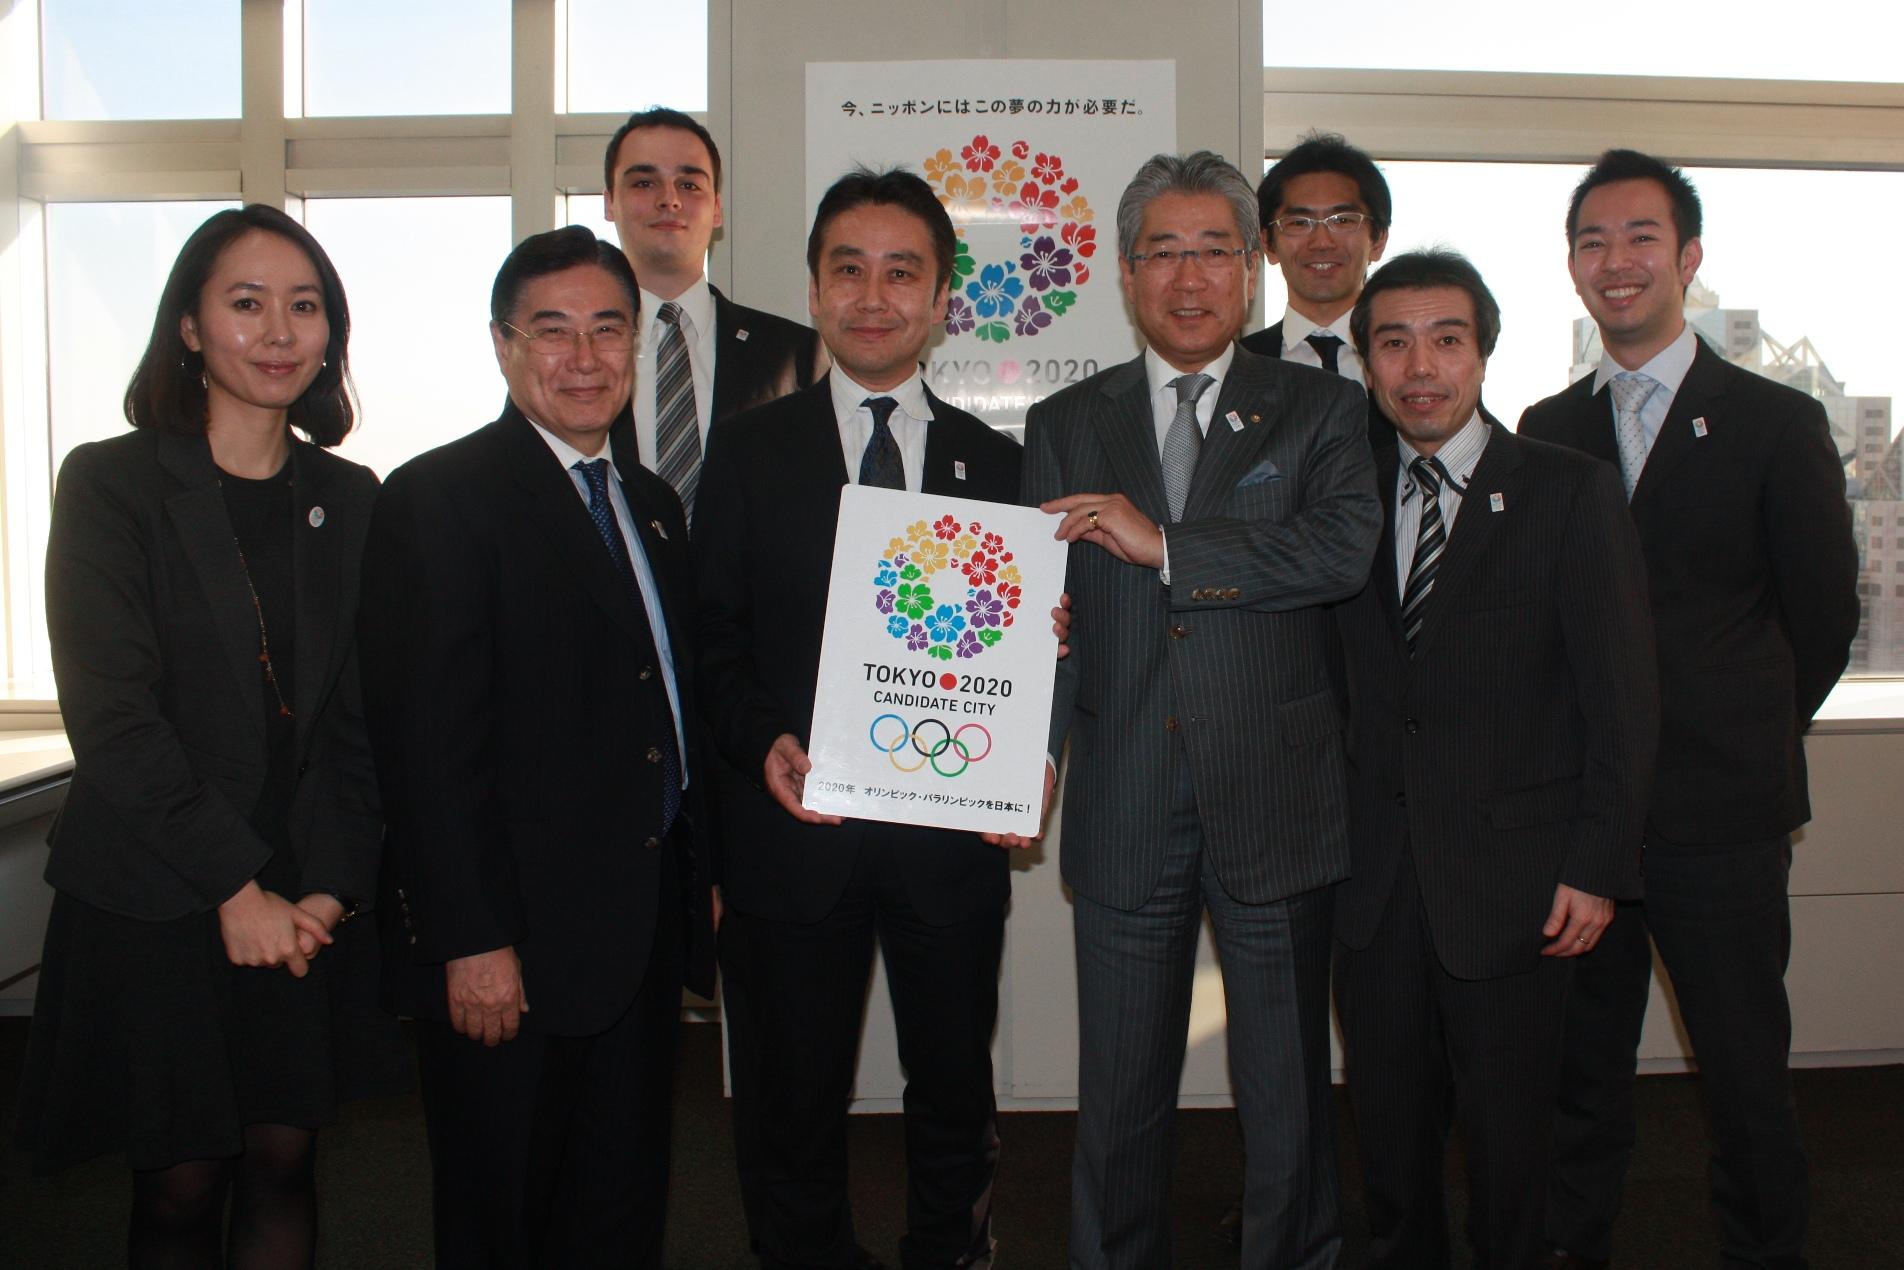 Tokyo 2020 communications team